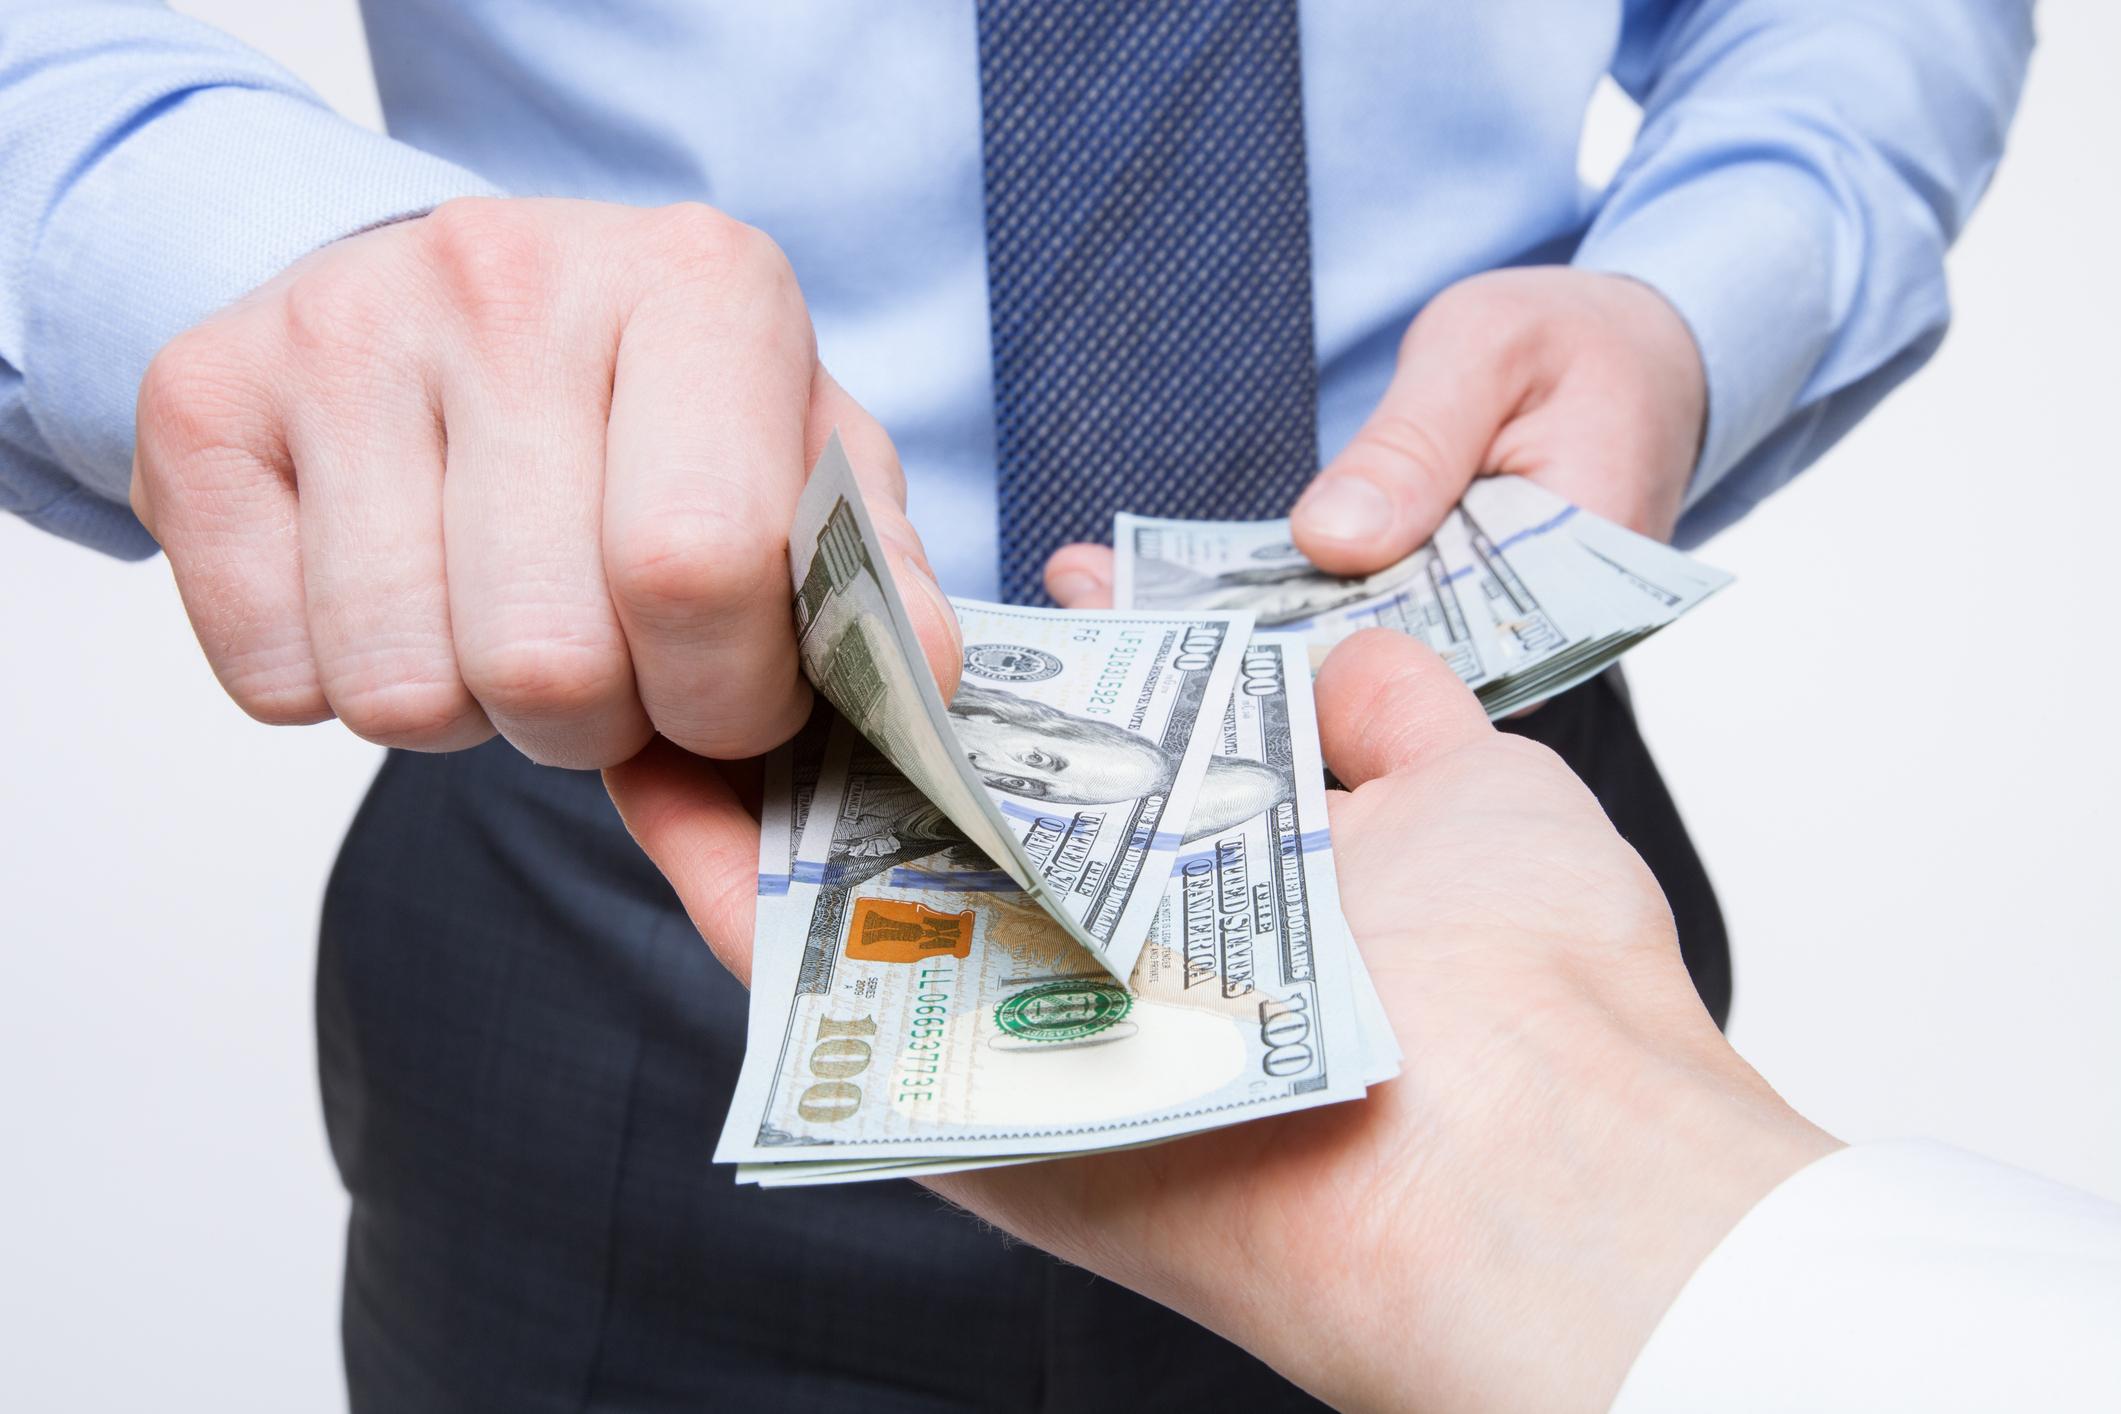 Hands exchanging hundred dollar bills.